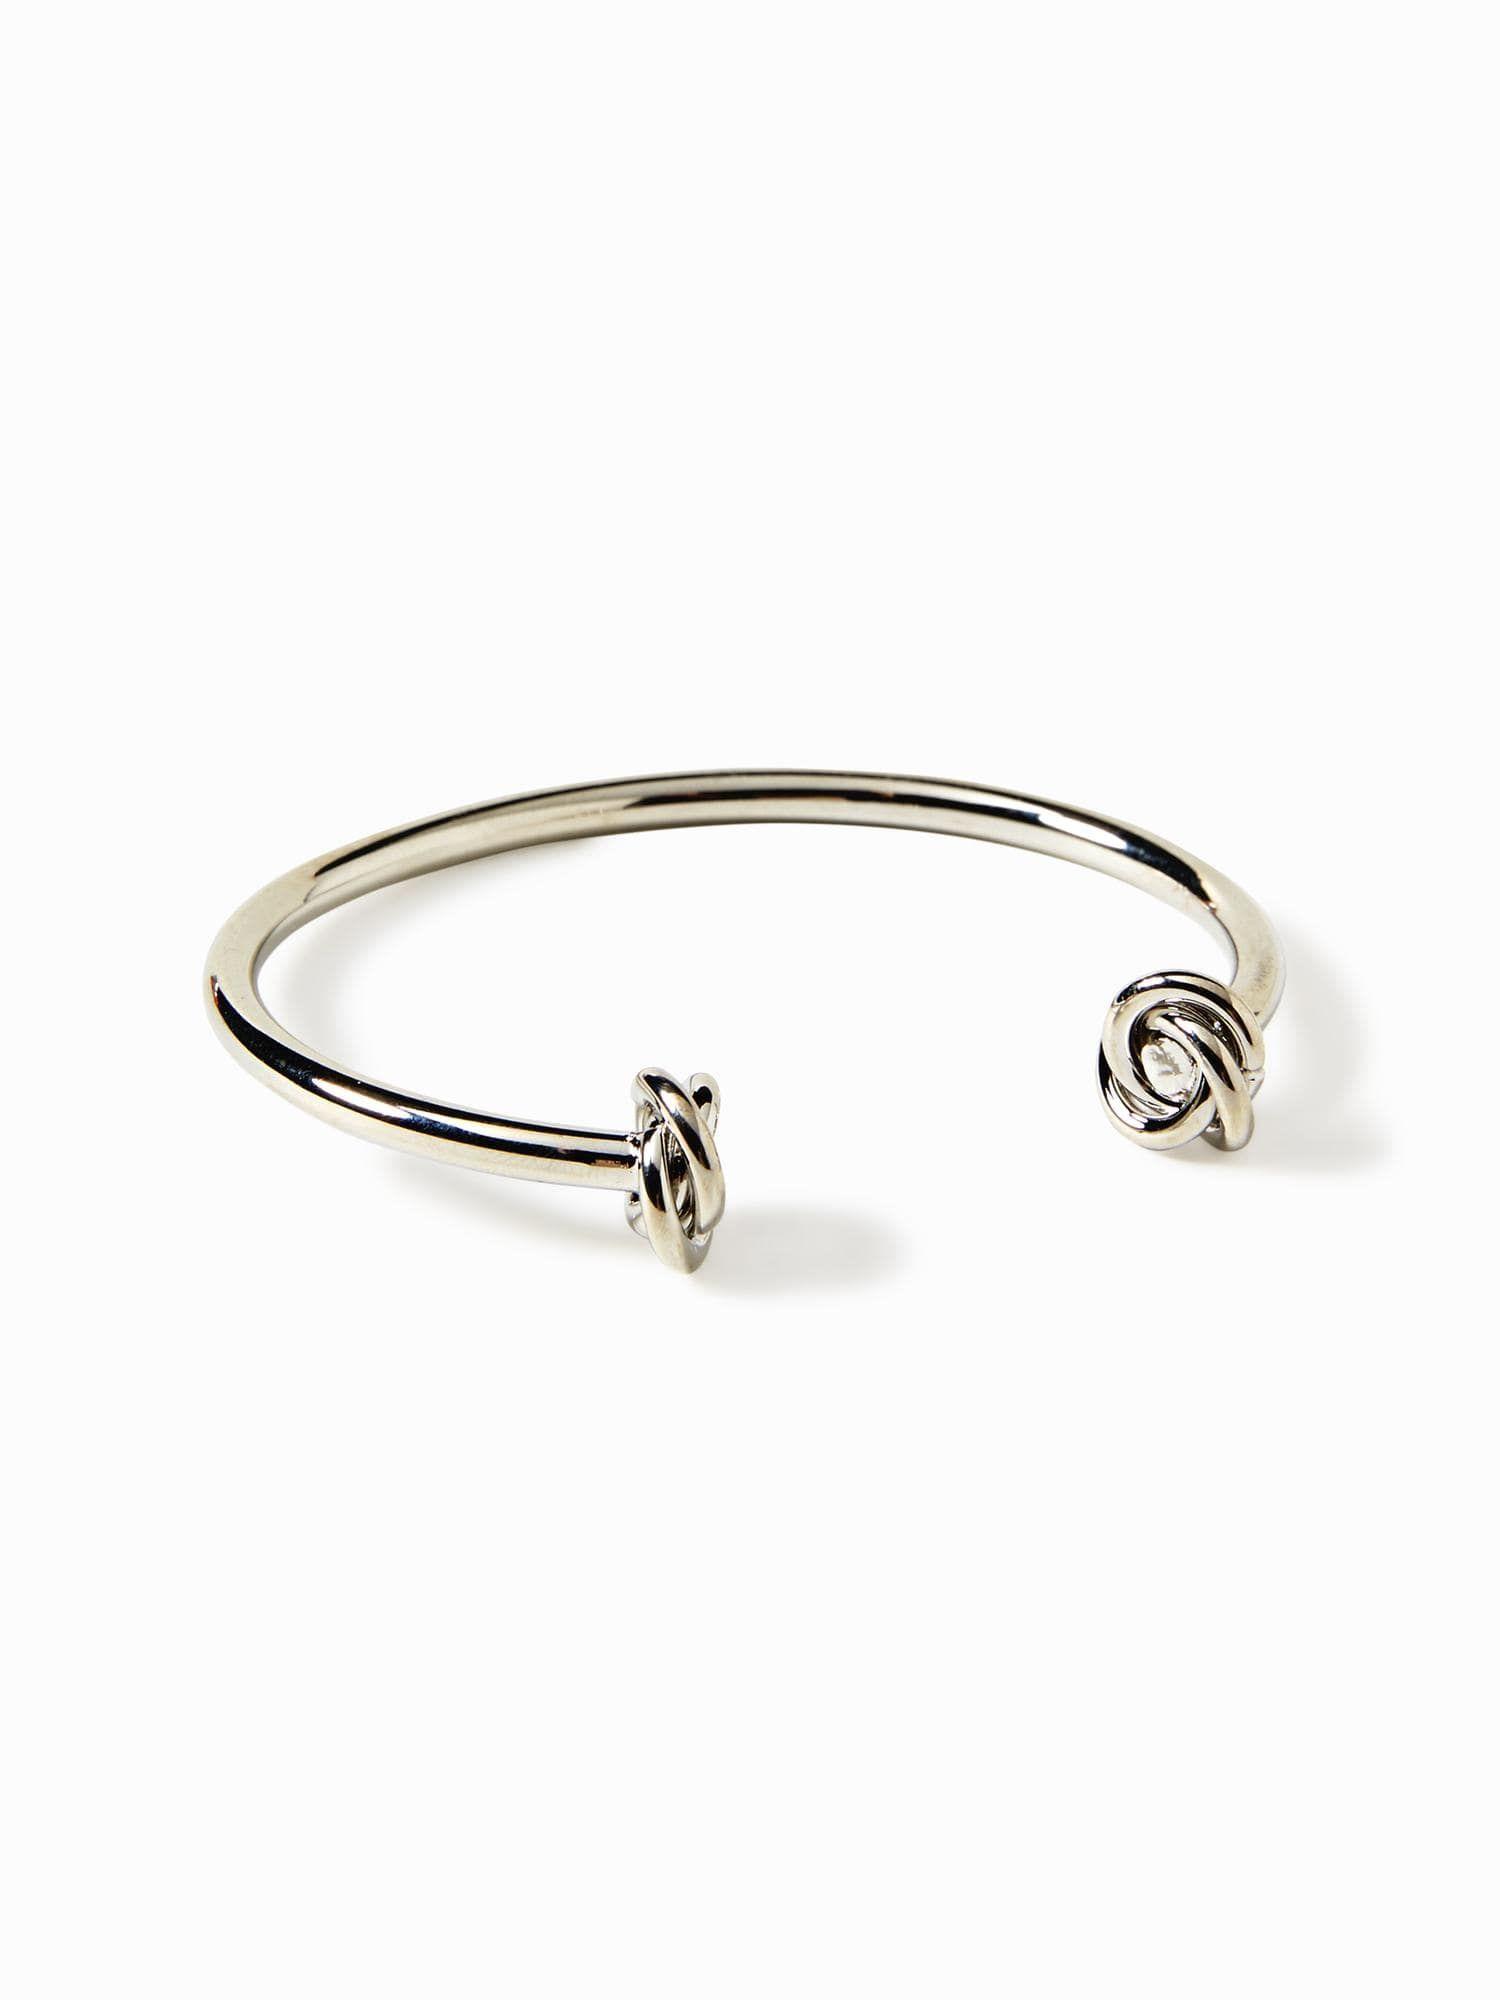 Knotted cuff bangle bracelet for women old navy jt pinterest